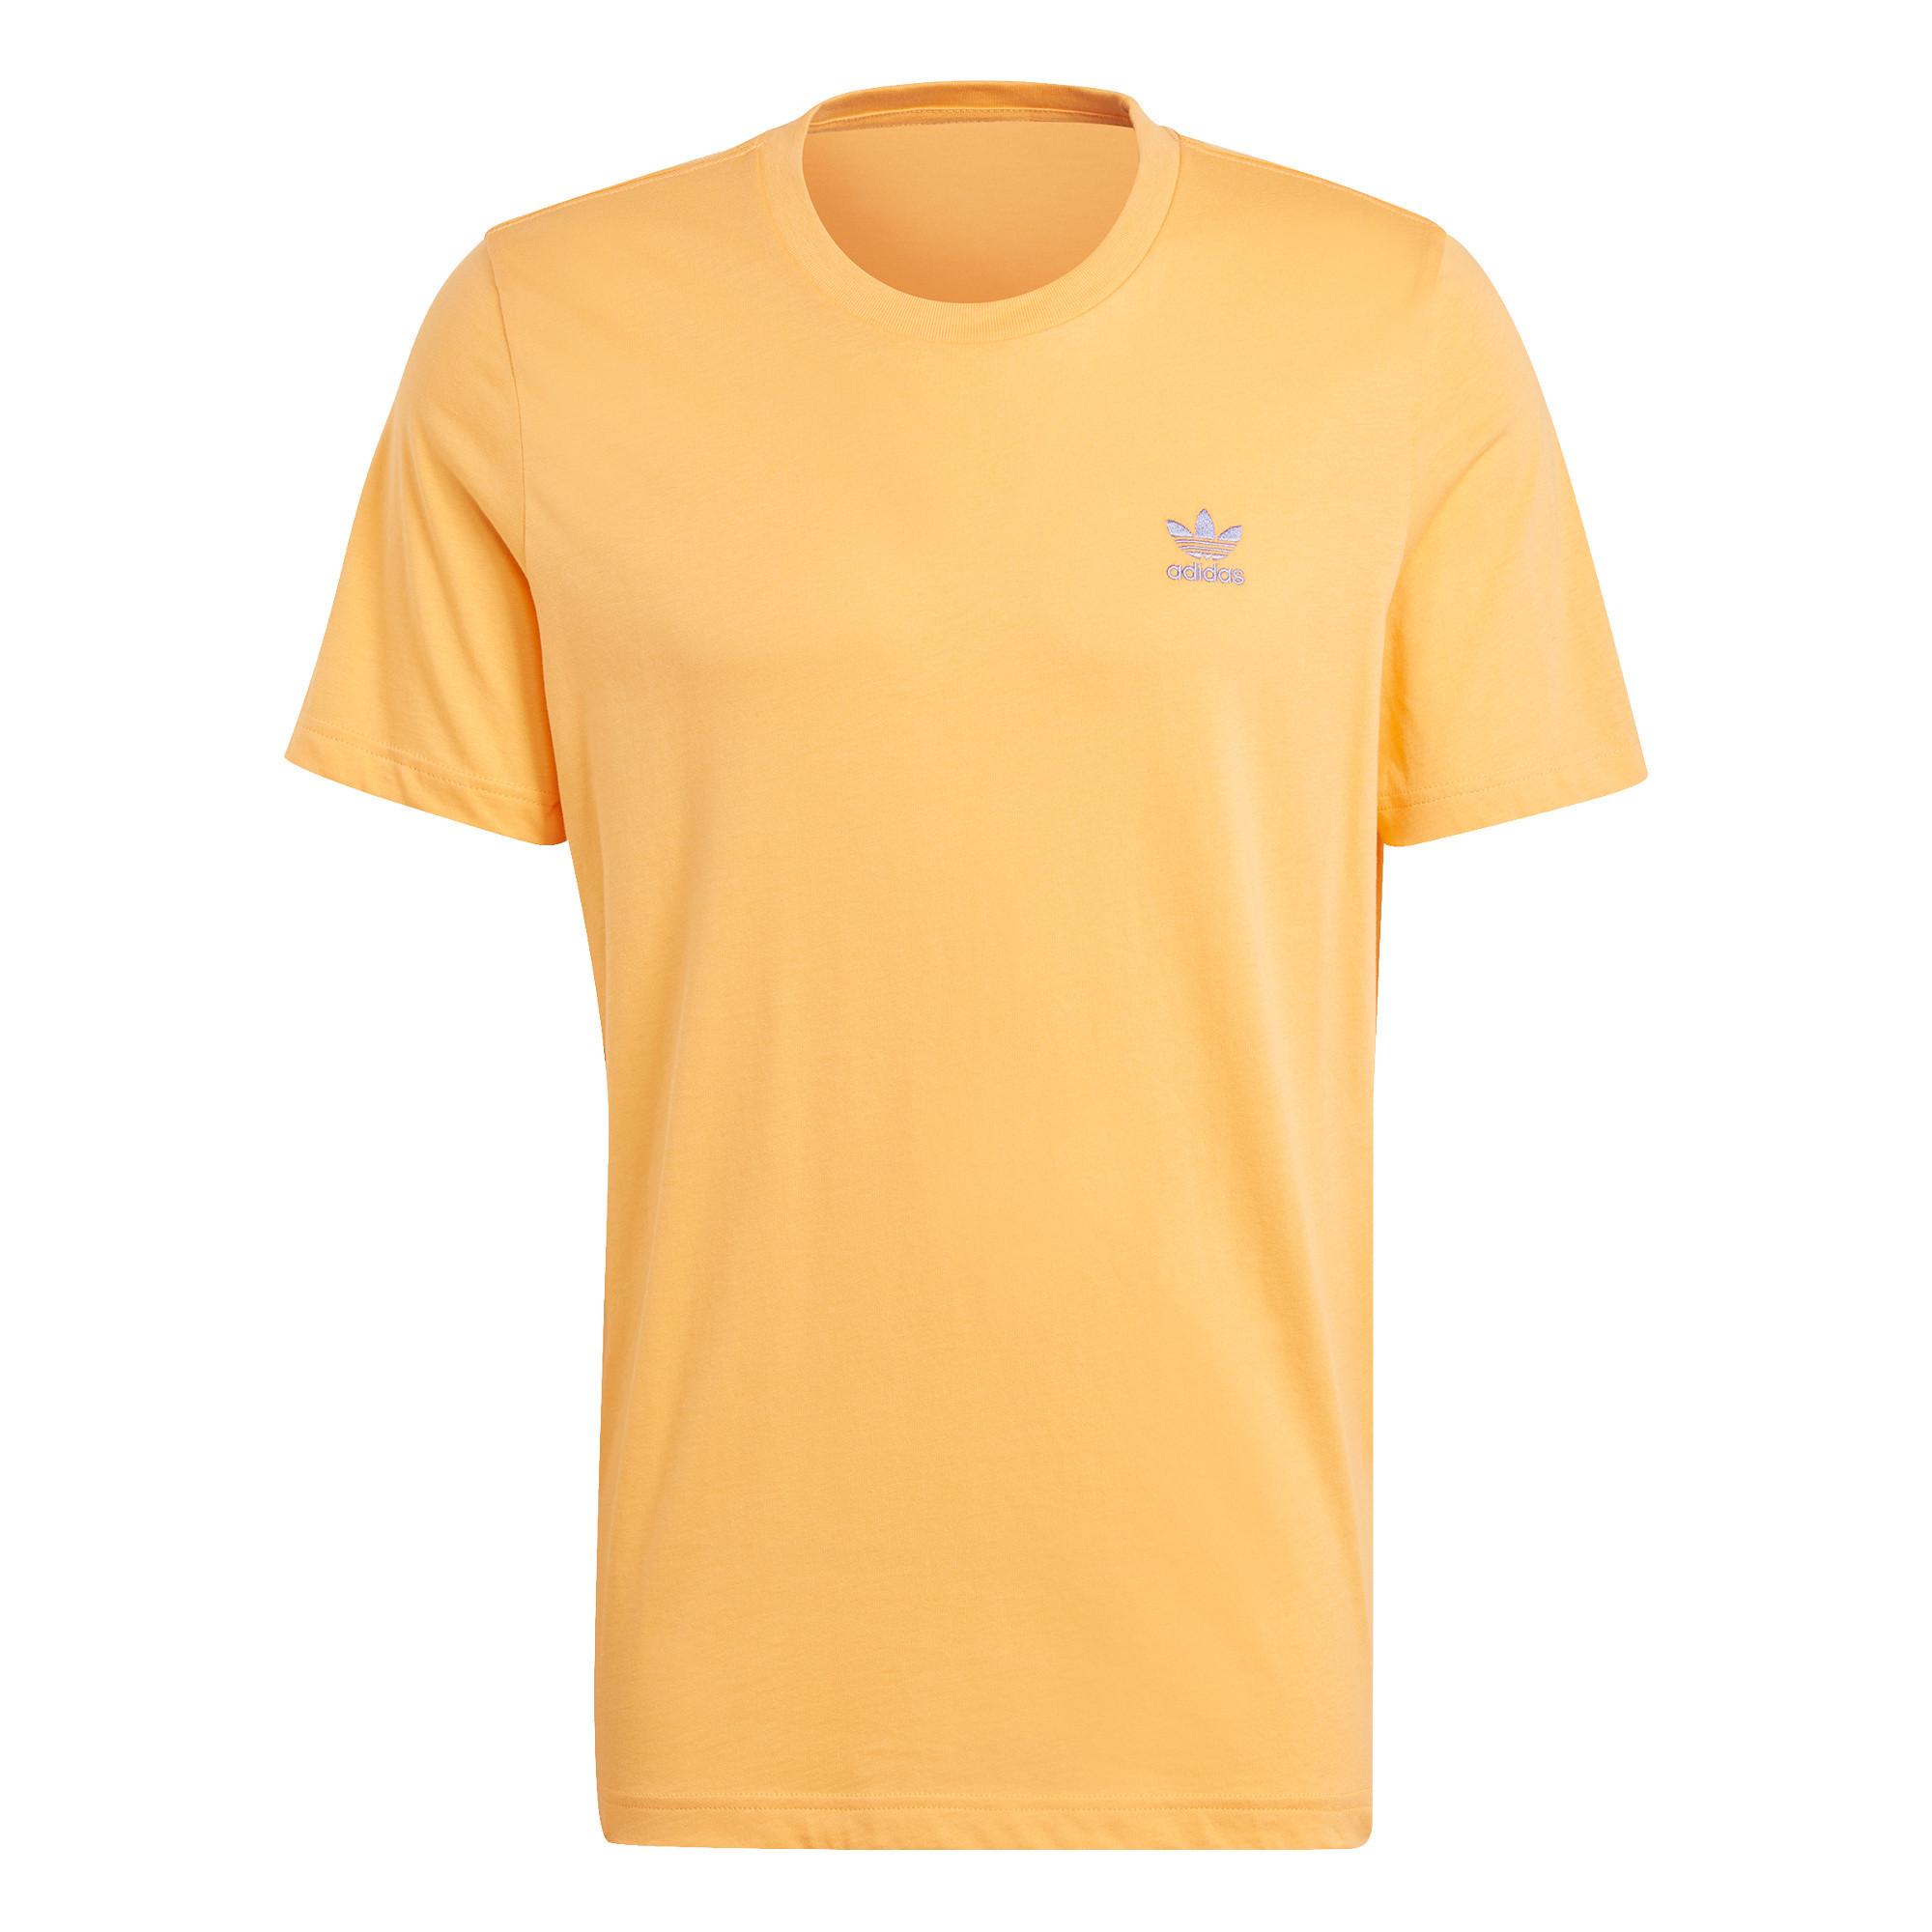 T-shirt loungewear adicolor trefoil essentials, Arancione, large image number 0